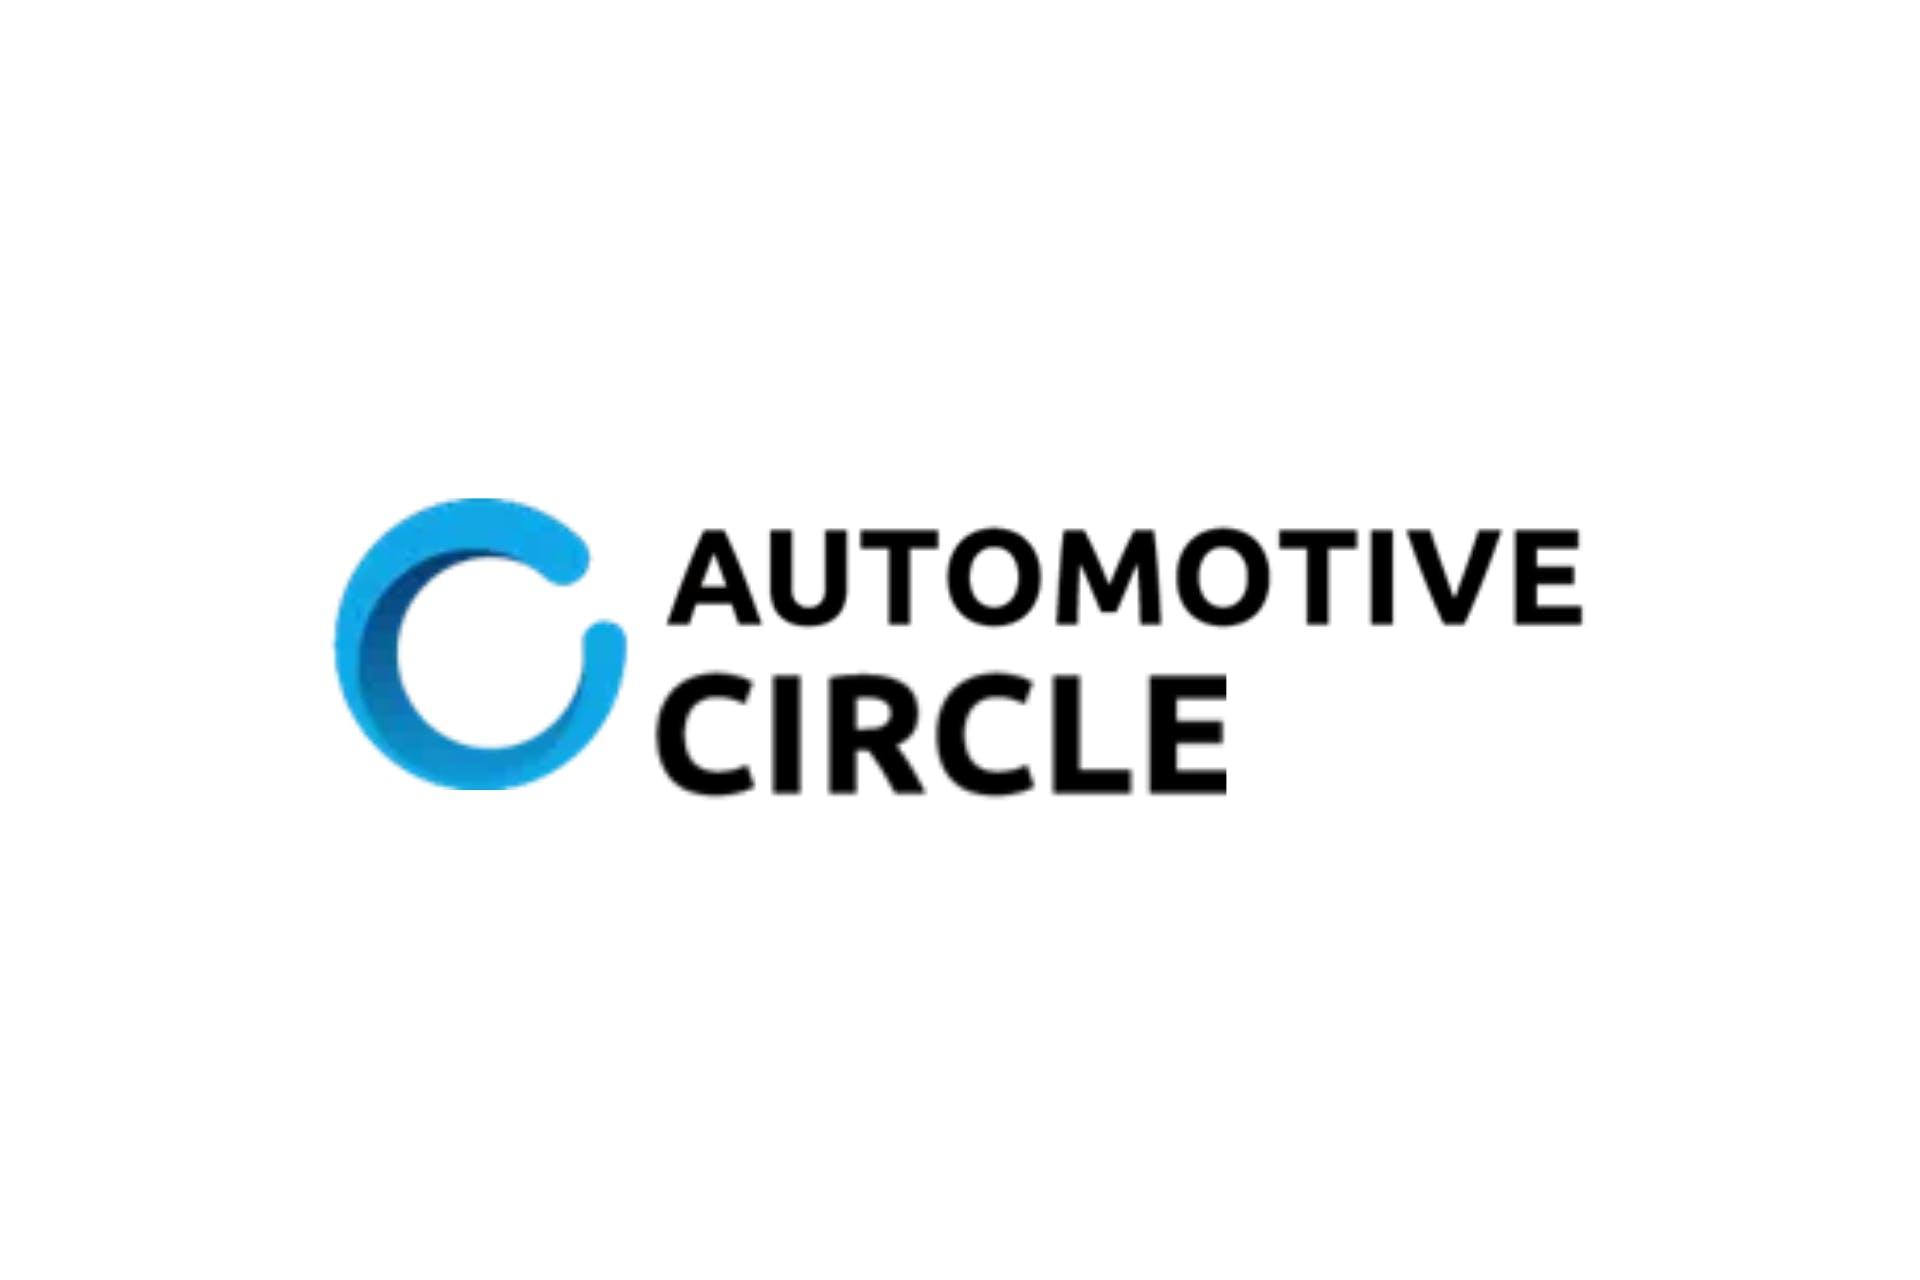 Automotive Circle